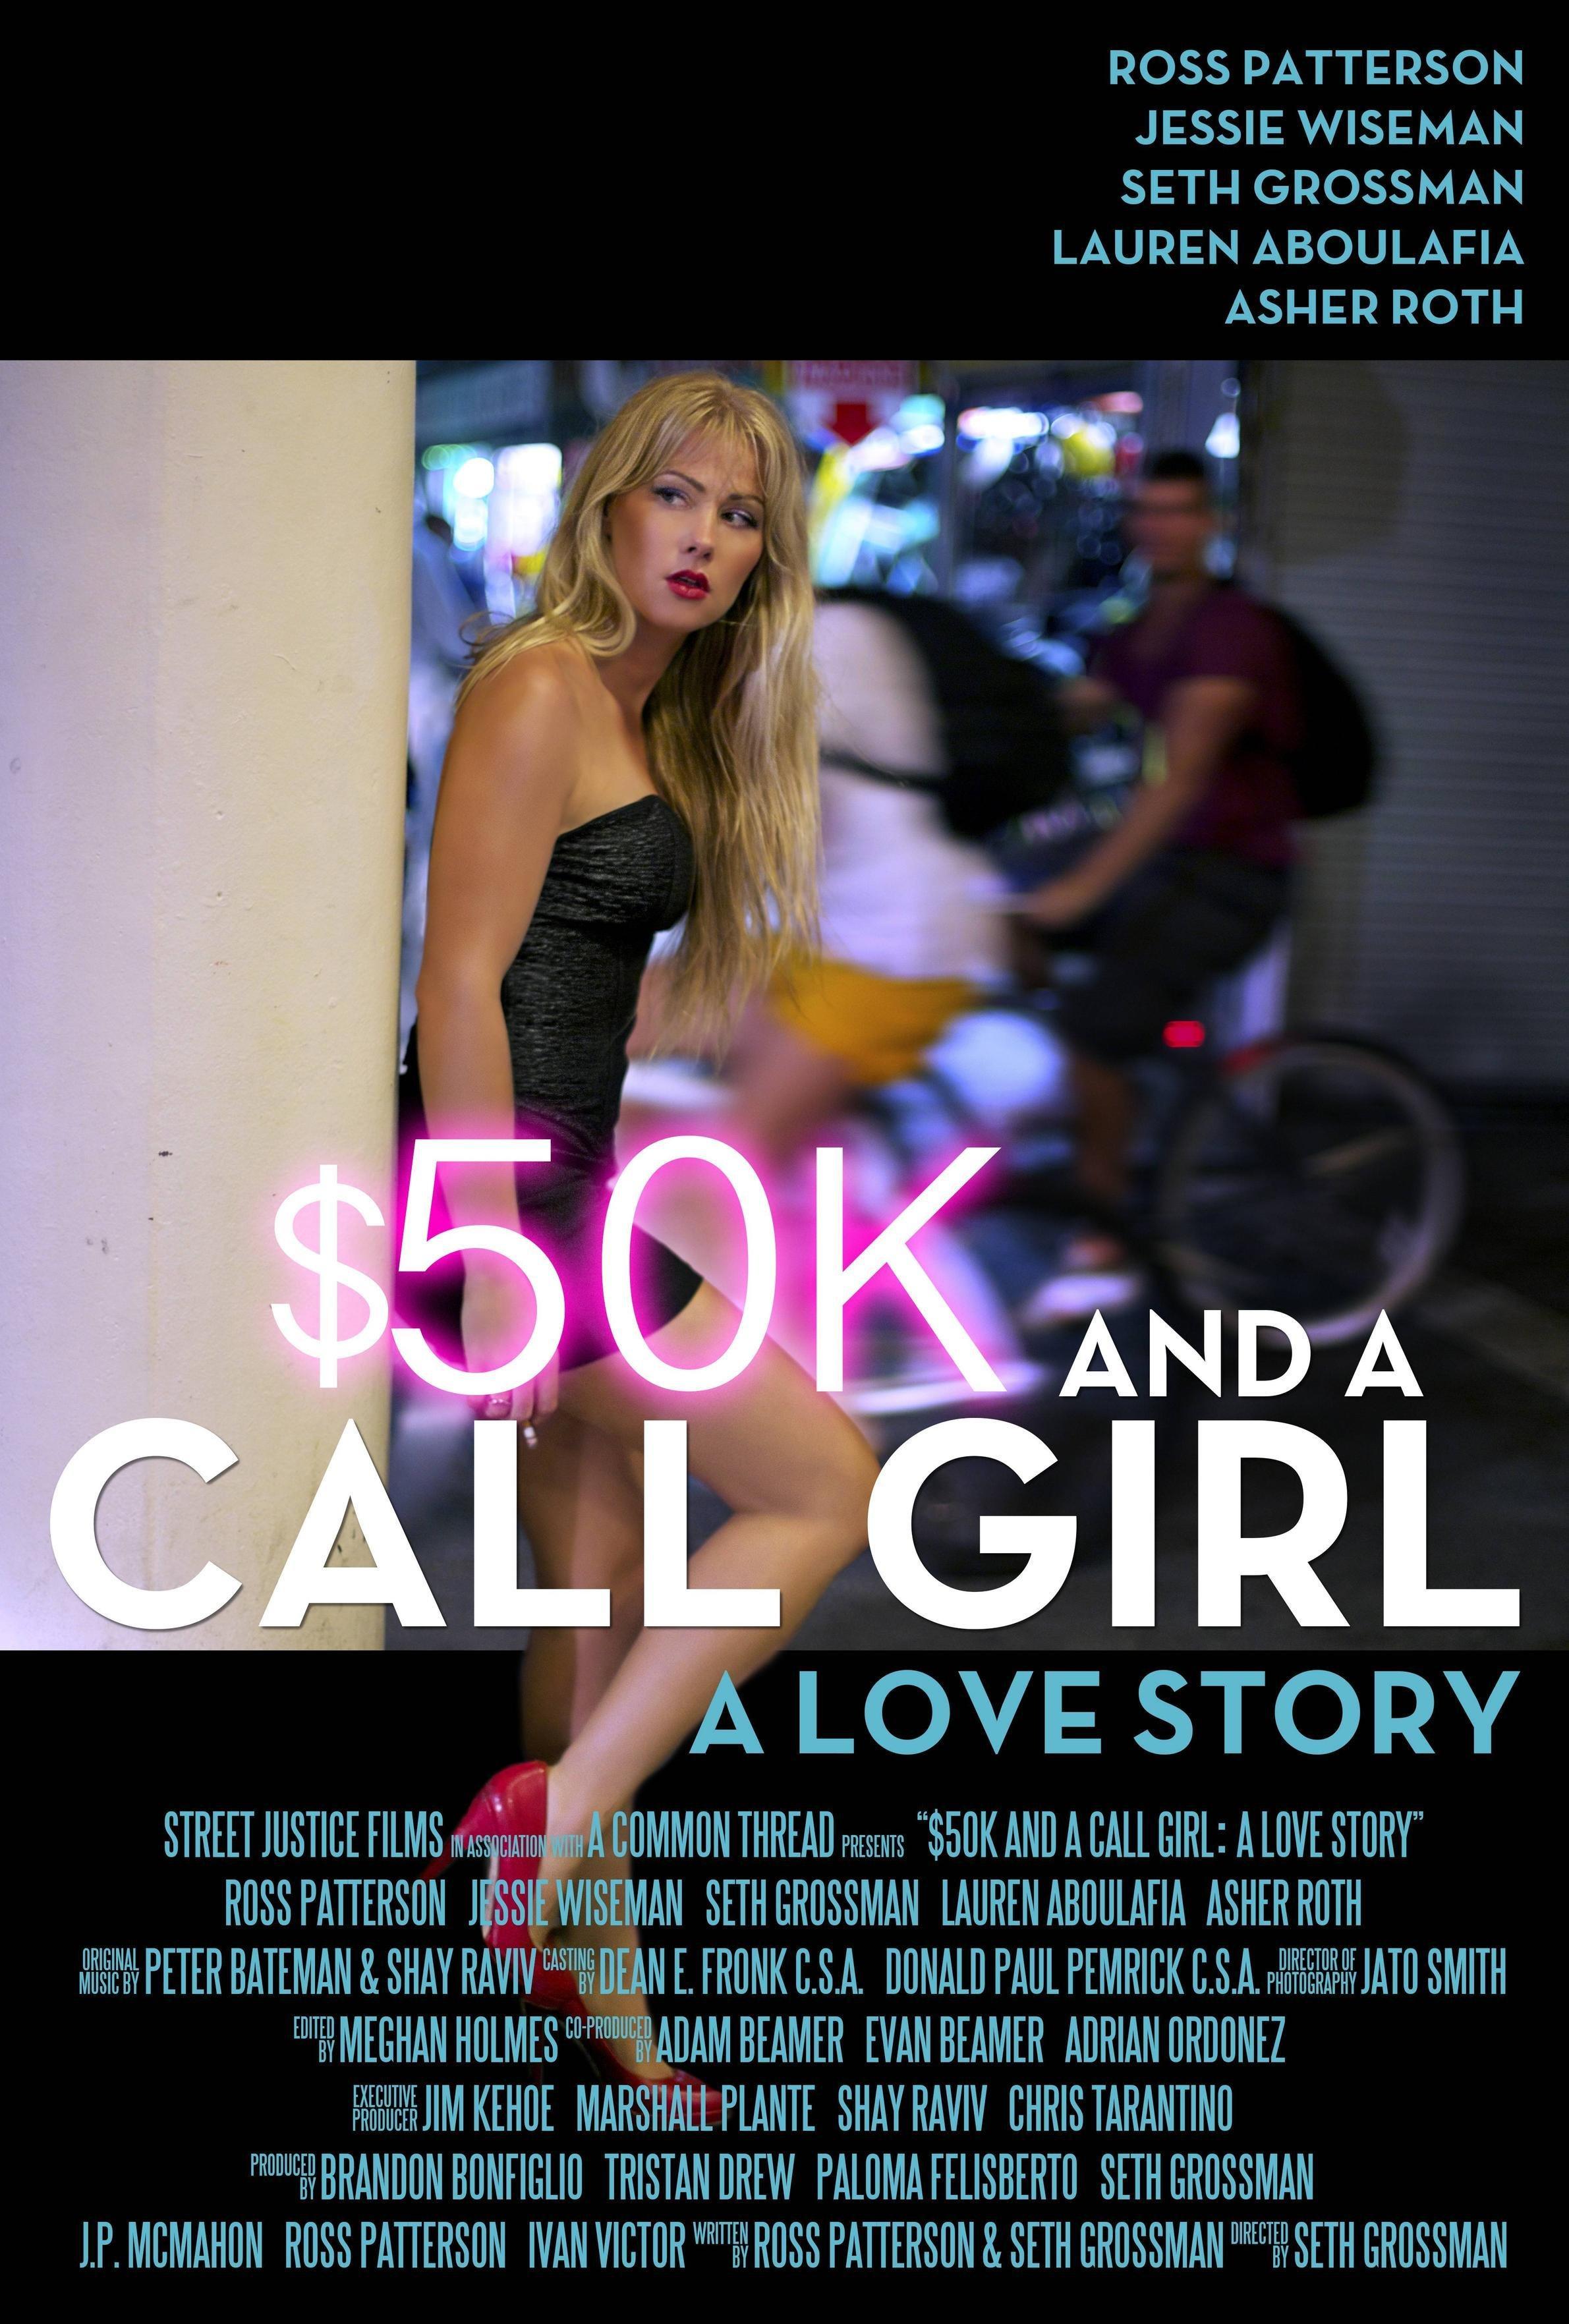 Call girl in Seth